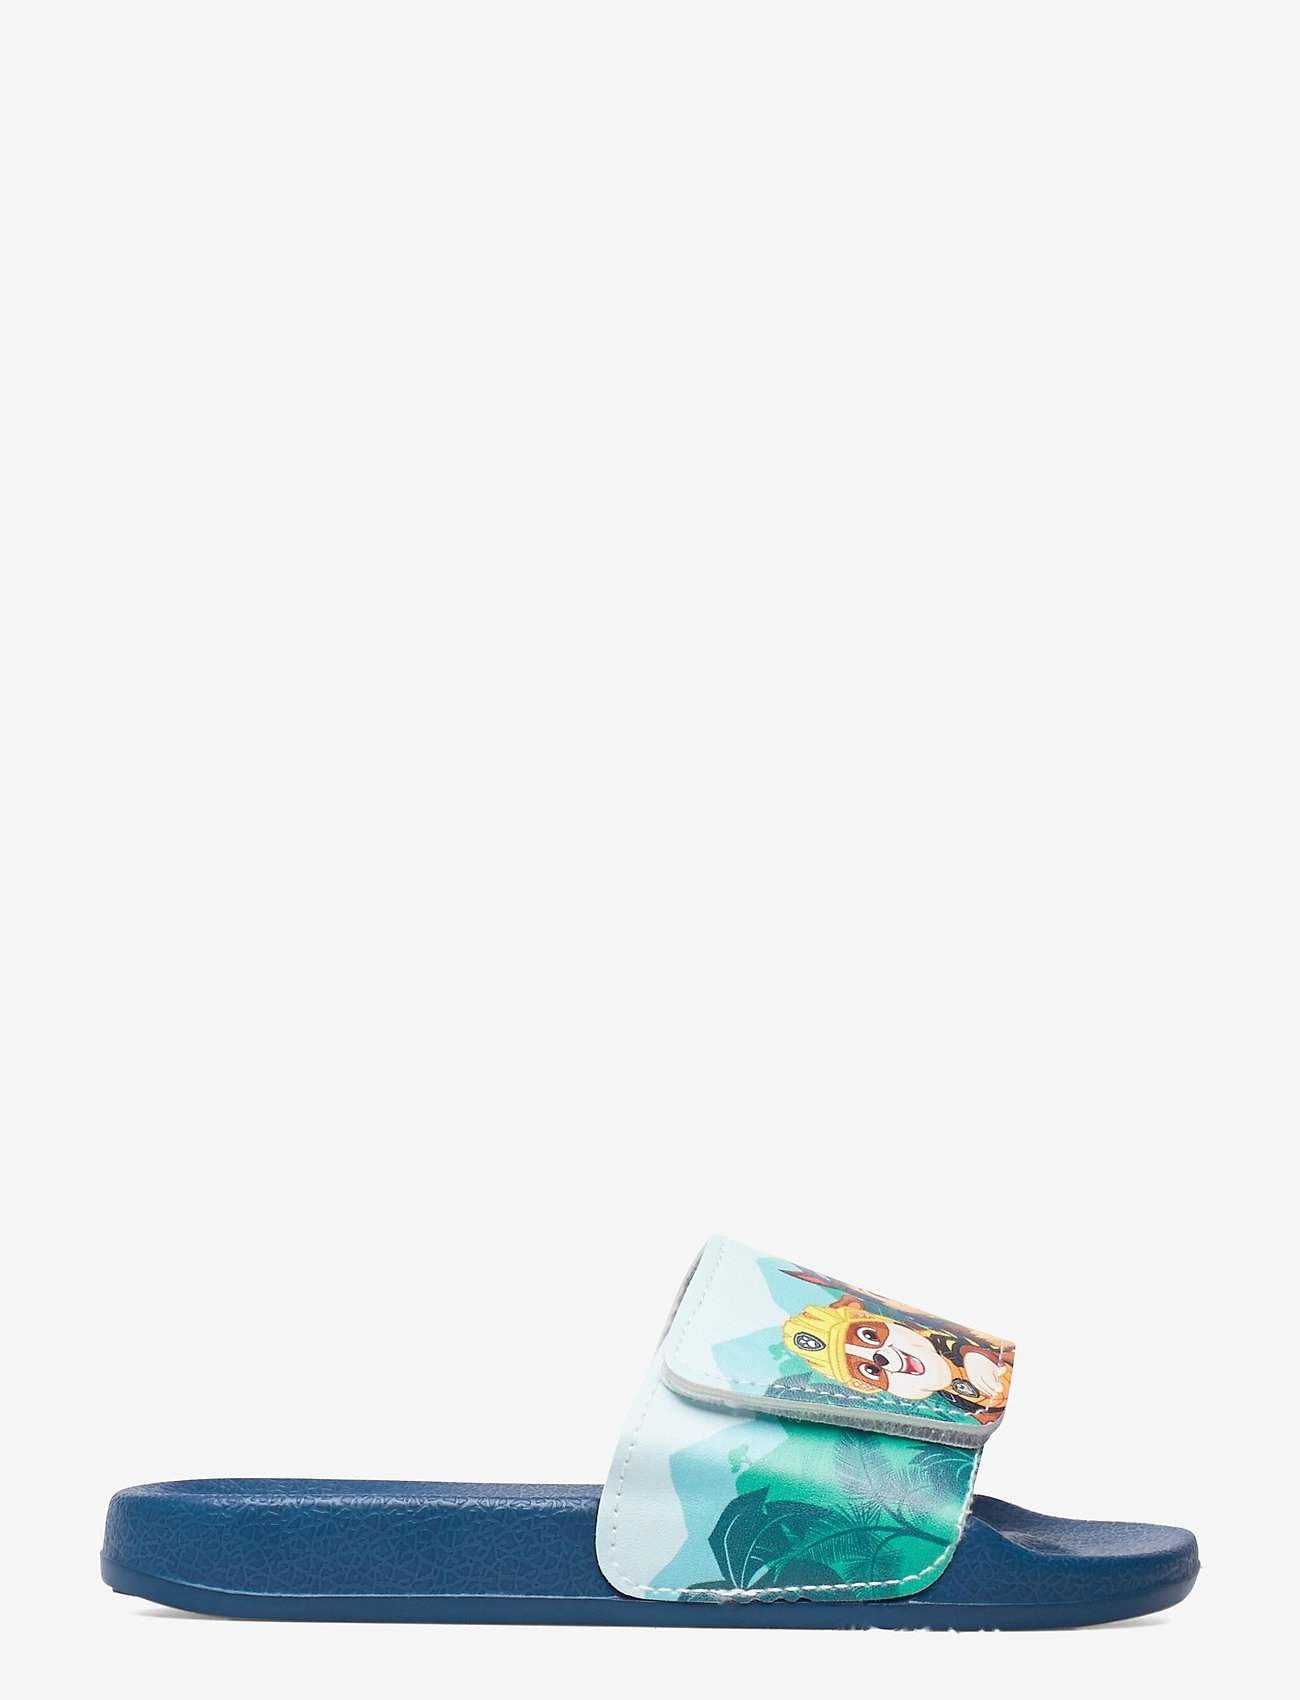 Paw Patrol - paw patrol aqua slipper - schuhe - blue - 1